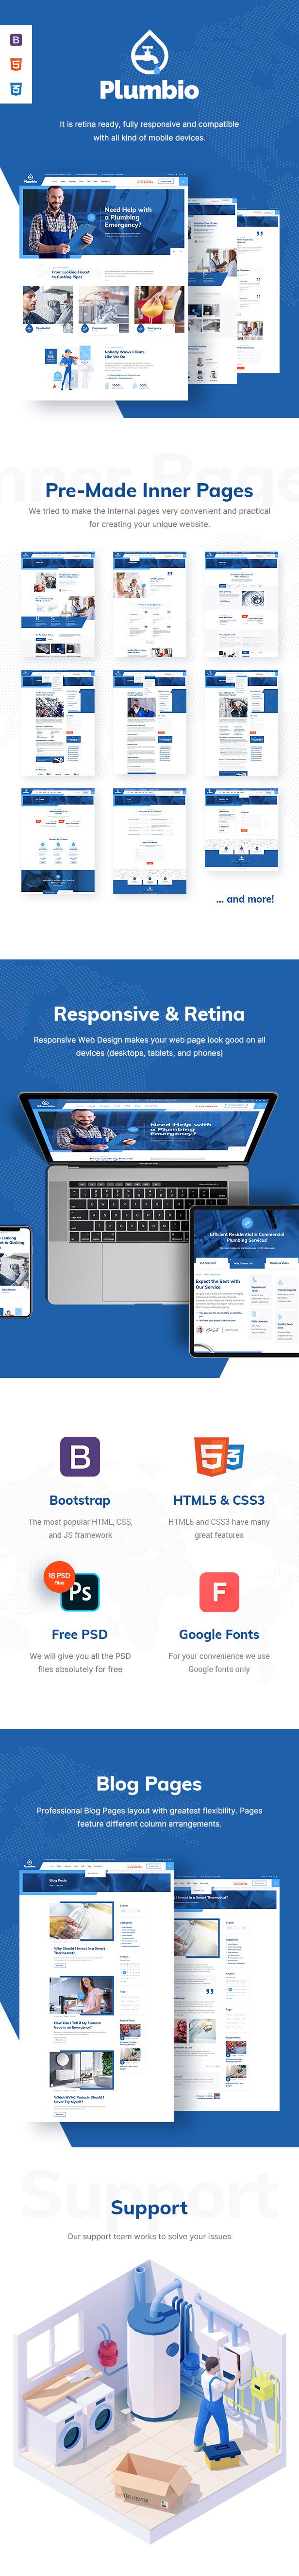 Plumbio - Plumbing Services HTML Template - 1